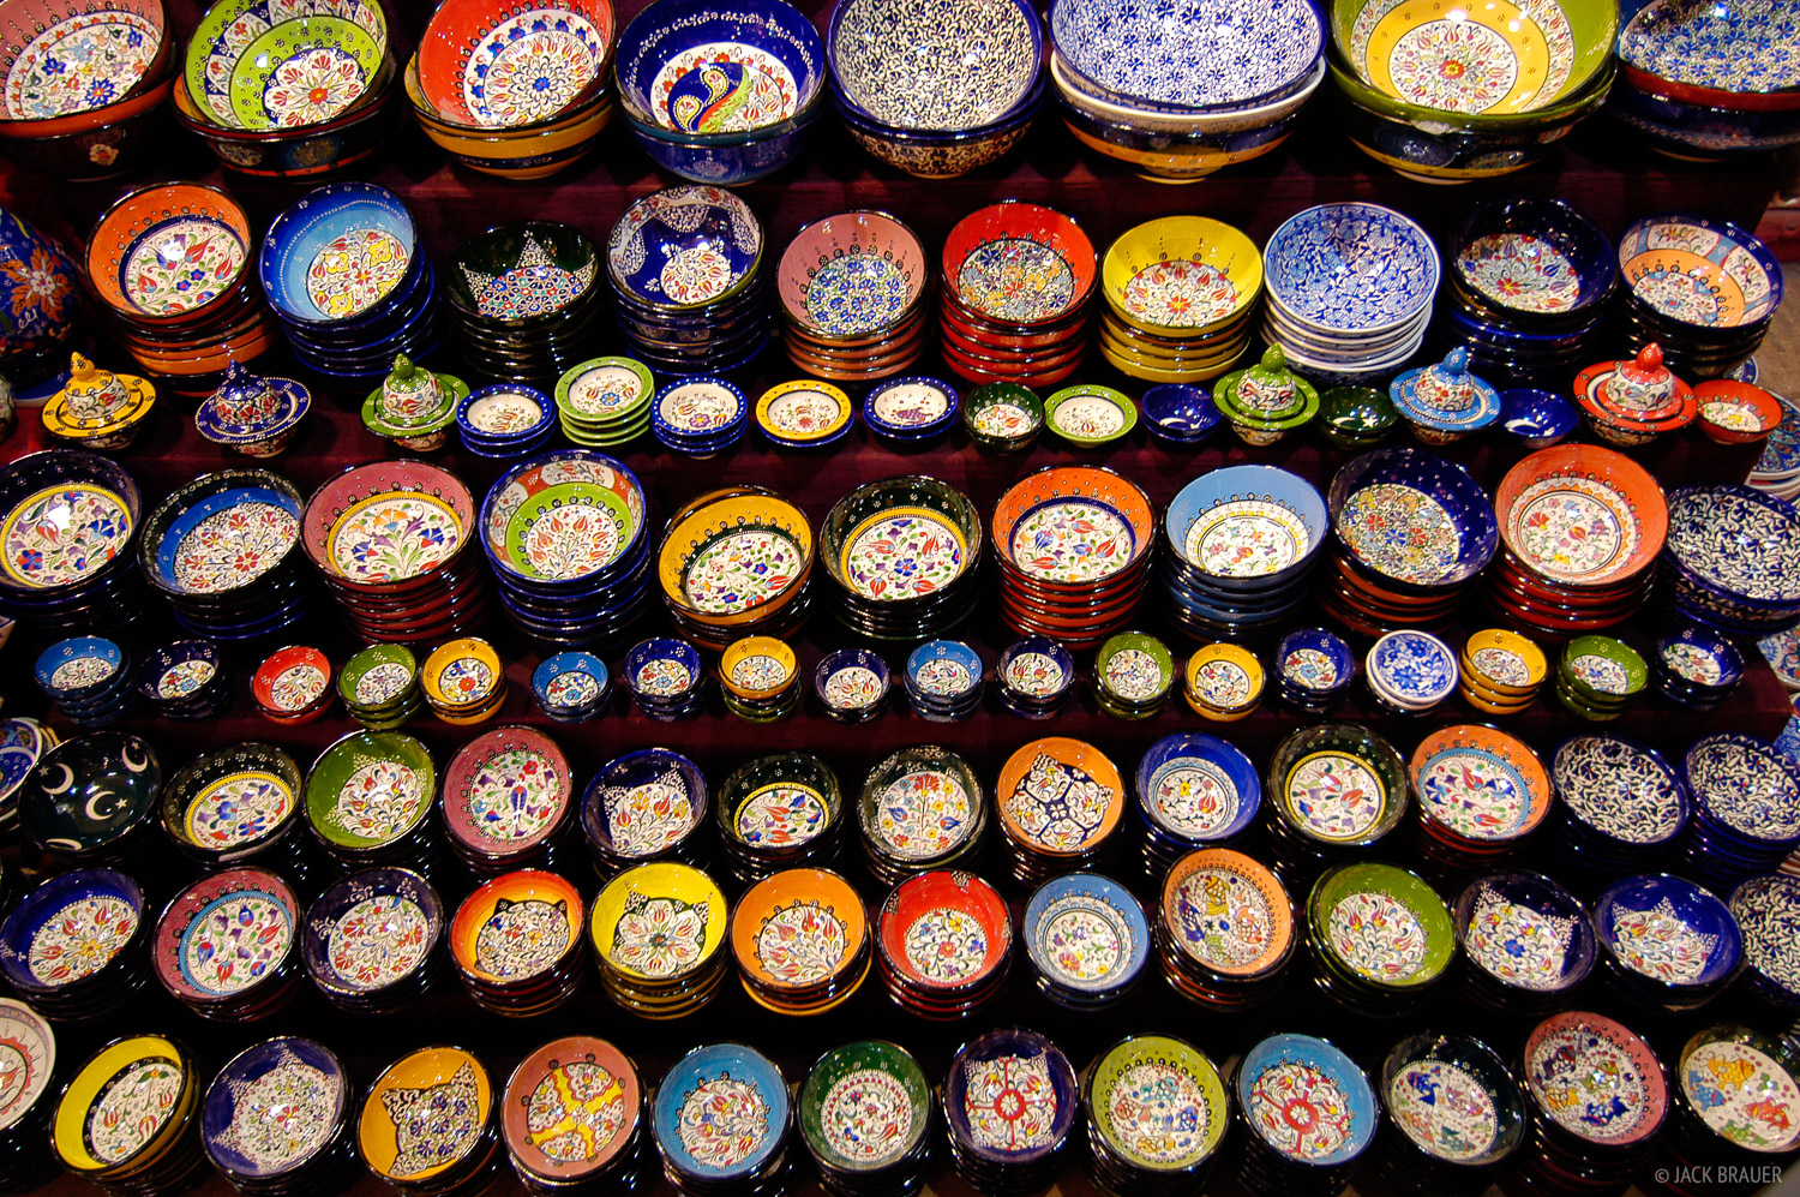 bowls, Grand Bazaar, Istanbul, Turkey, colorful, photo